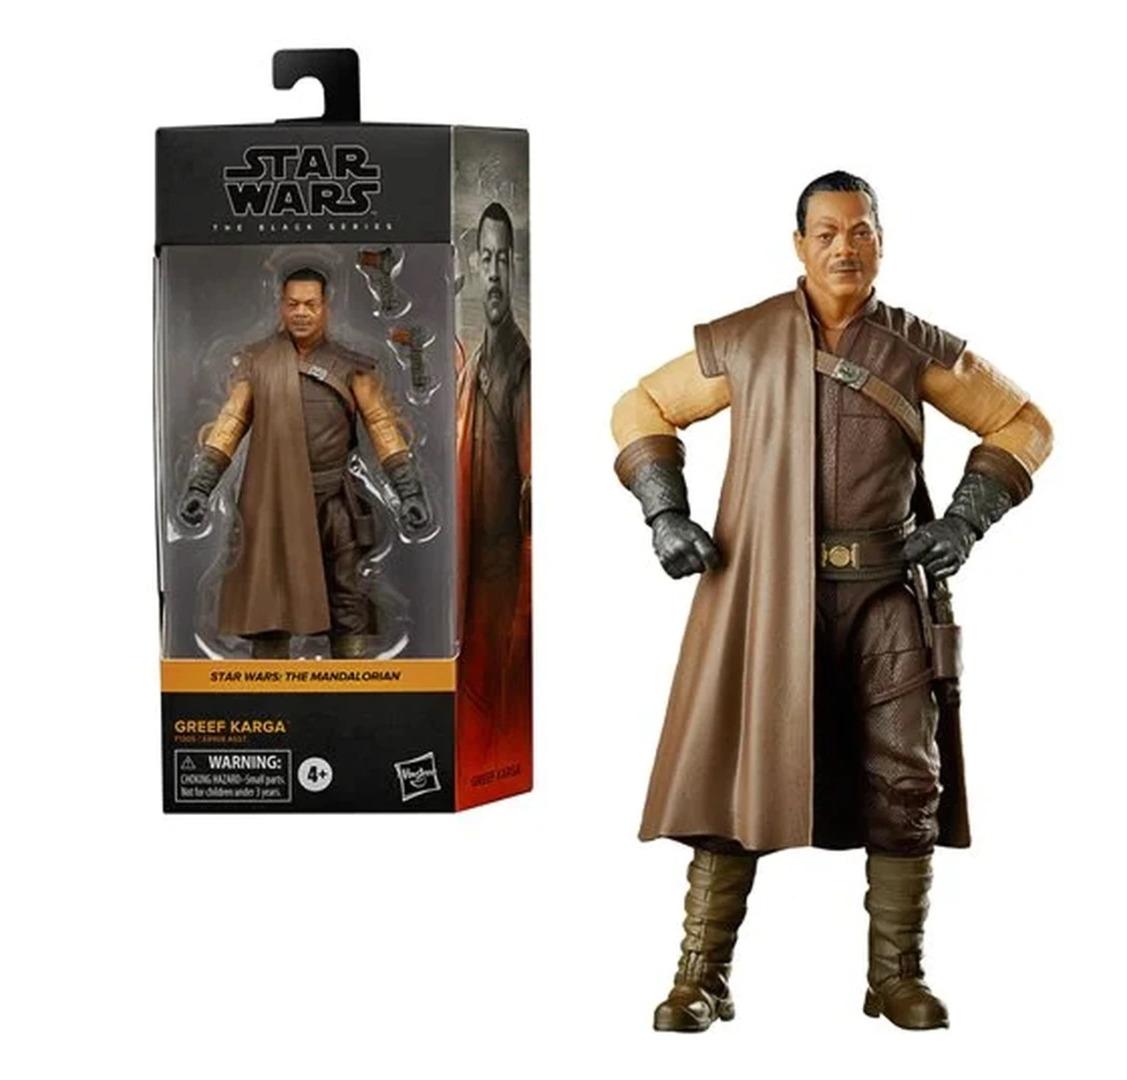 Star Wars Mandalorian The Black Series Greef Karga Action Figure 15 cm